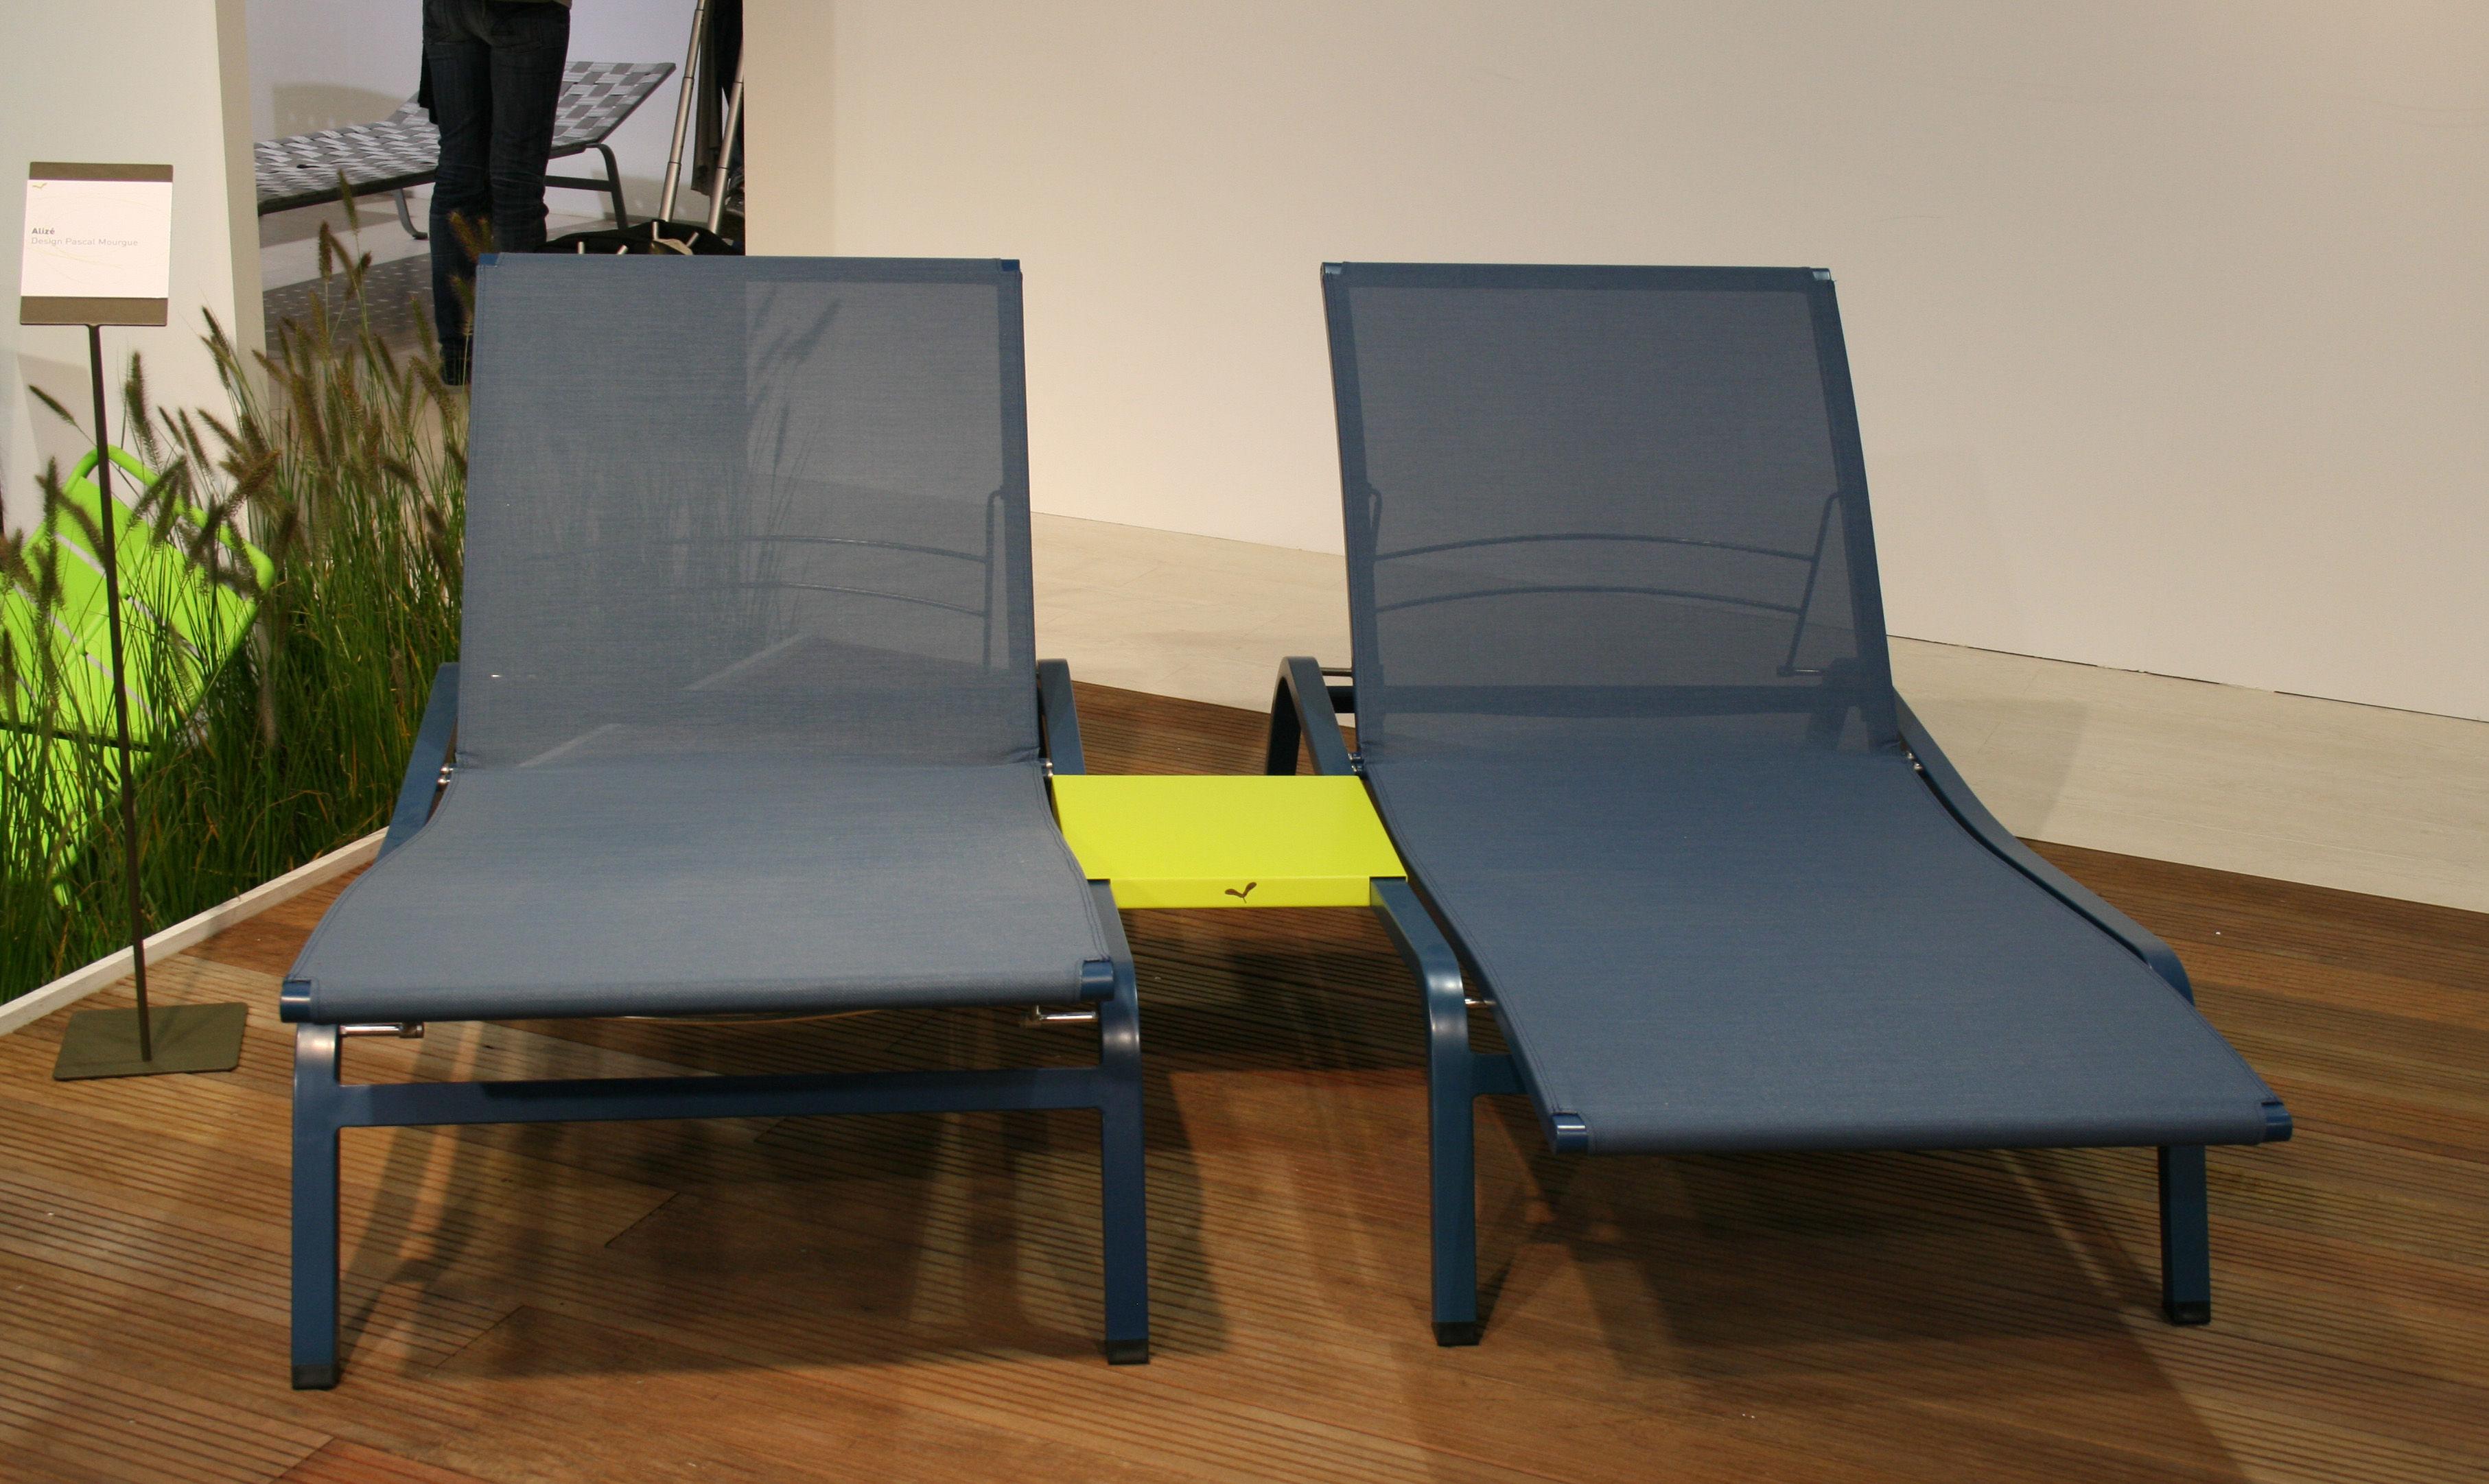 bain de soleil aliz larg 80 cm 3 positions r glisse fermob. Black Bedroom Furniture Sets. Home Design Ideas